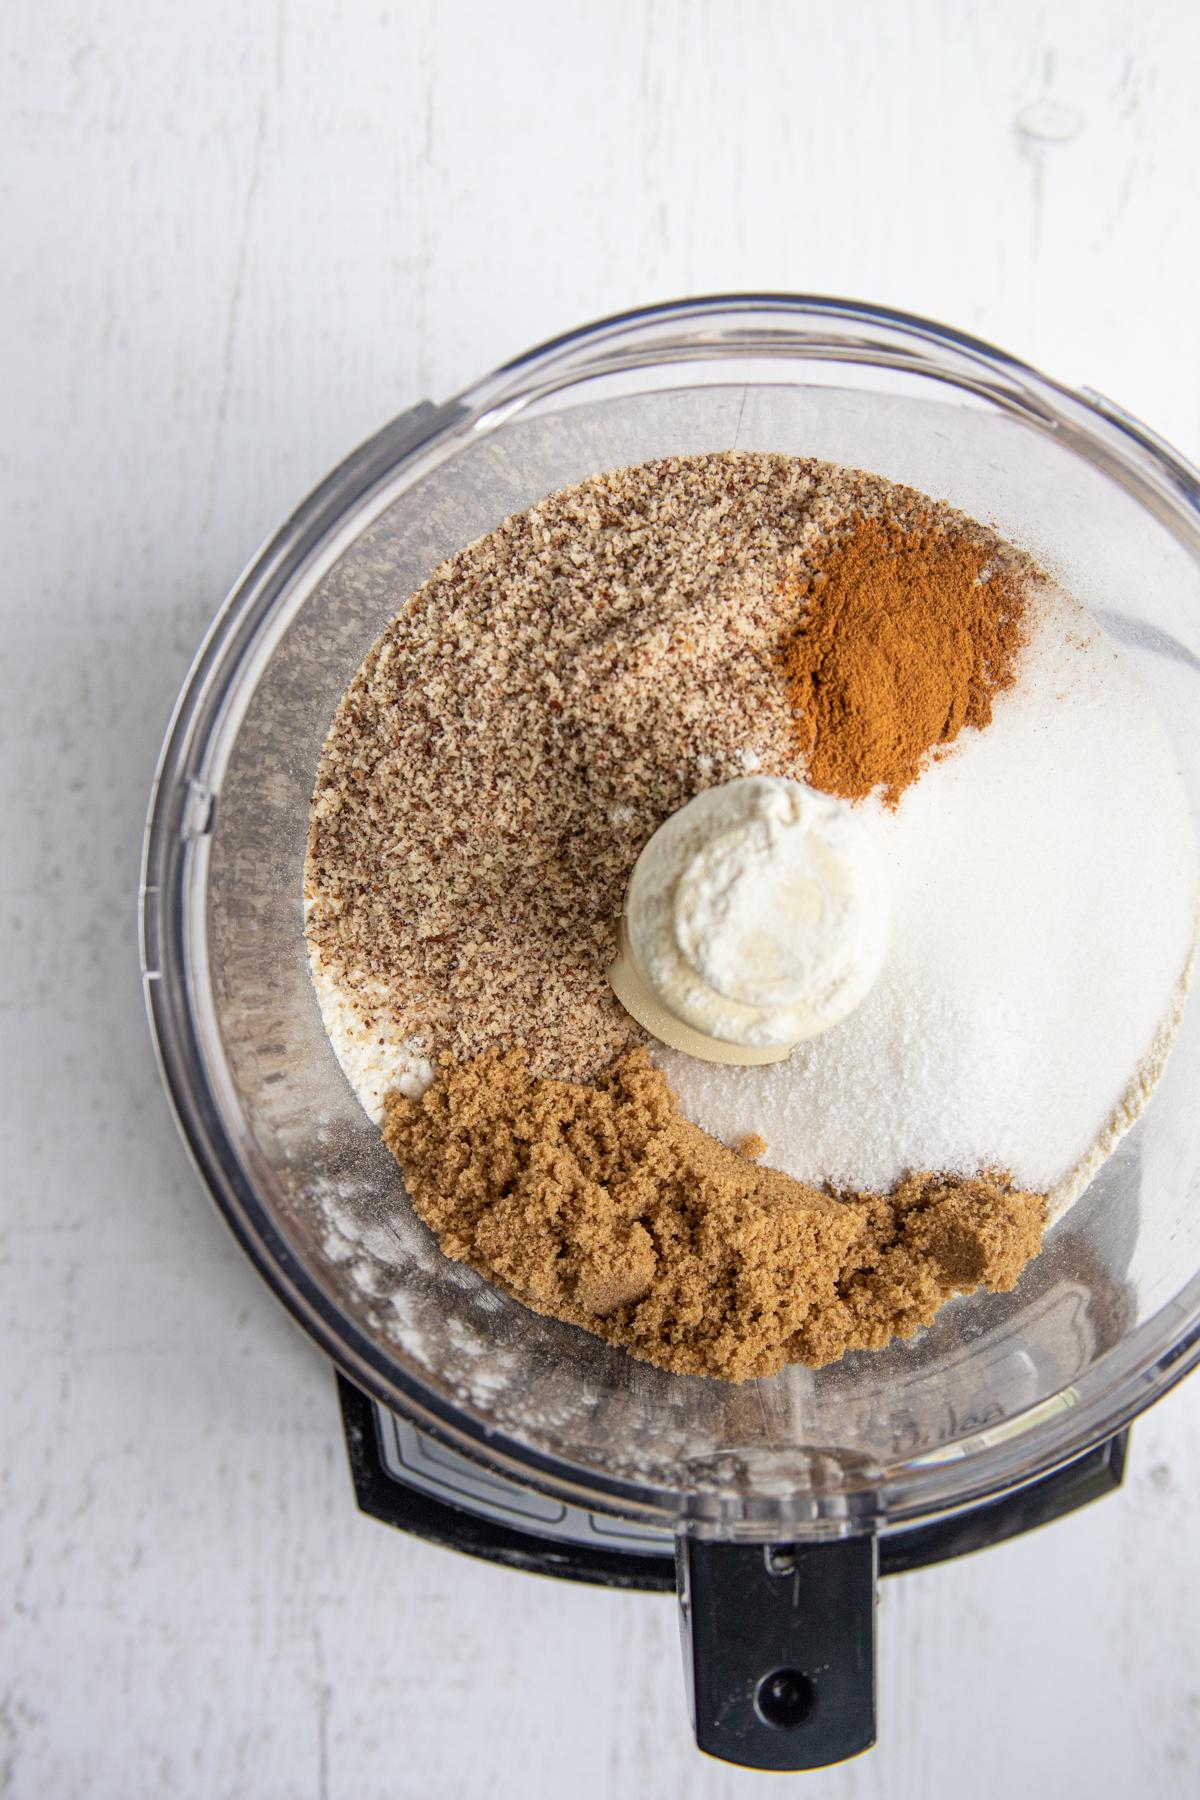 Hazelnut Cookies Ingredients in a Food Processor